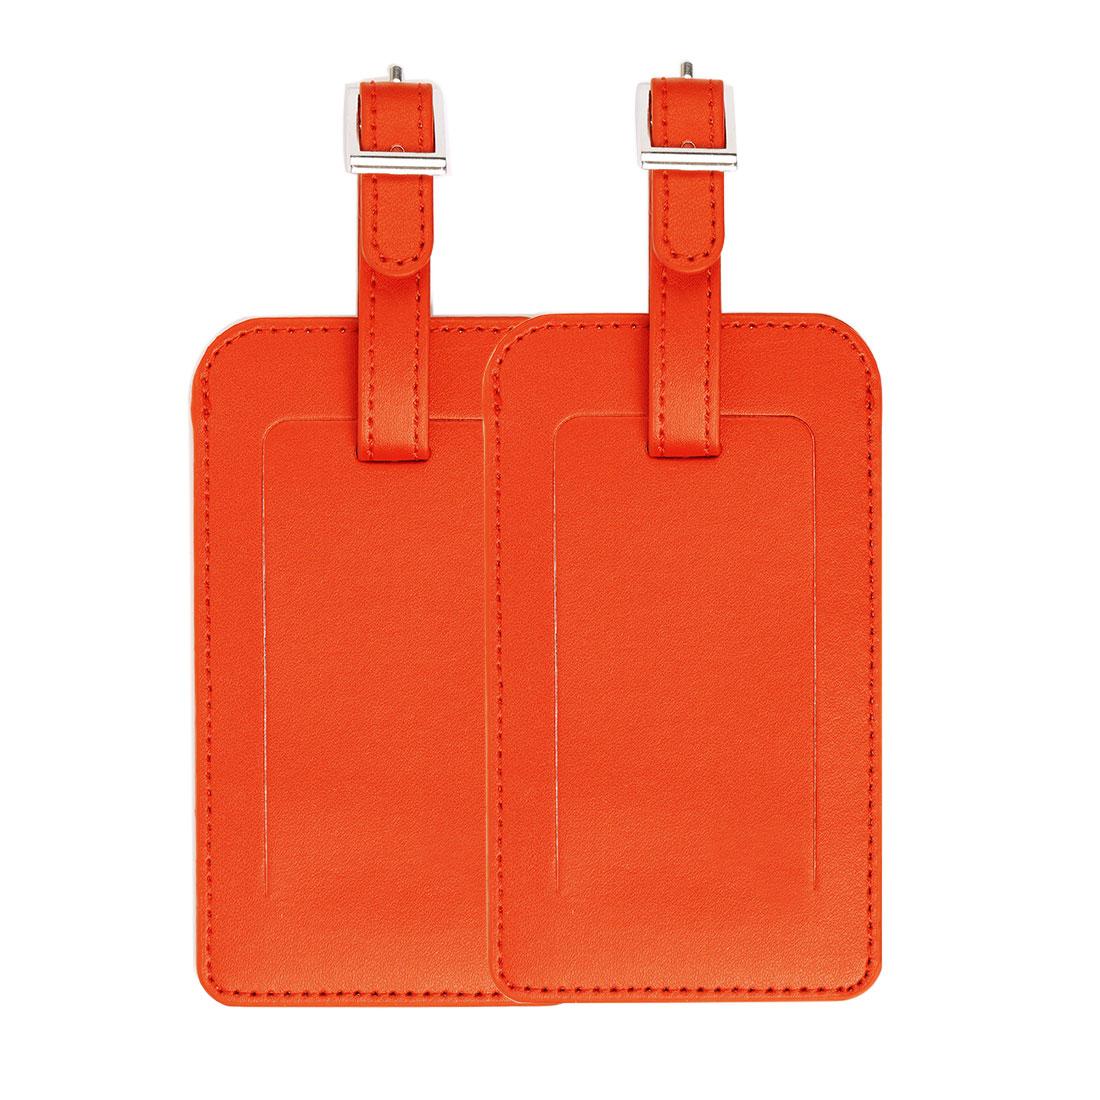 Travel PU Leather Luggage Suitcase Name Address Message Tag ID Label Orange 2pcs